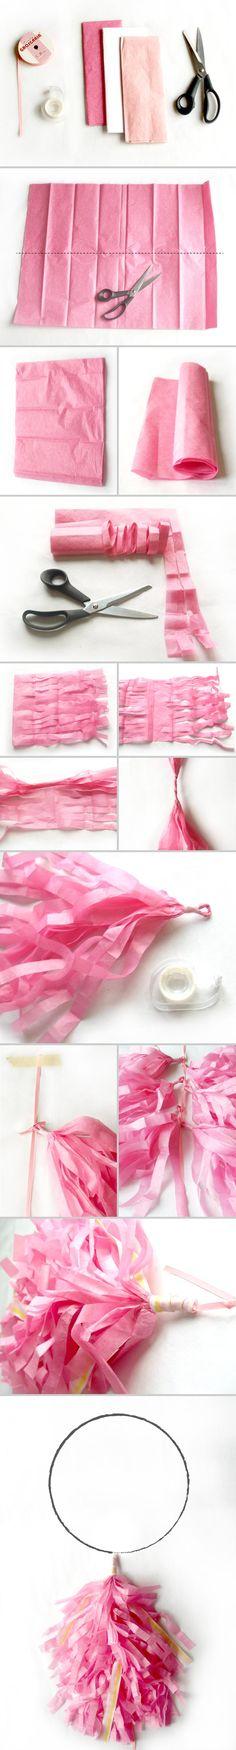 Balloon fringe. Different way to cut fringe tassels.